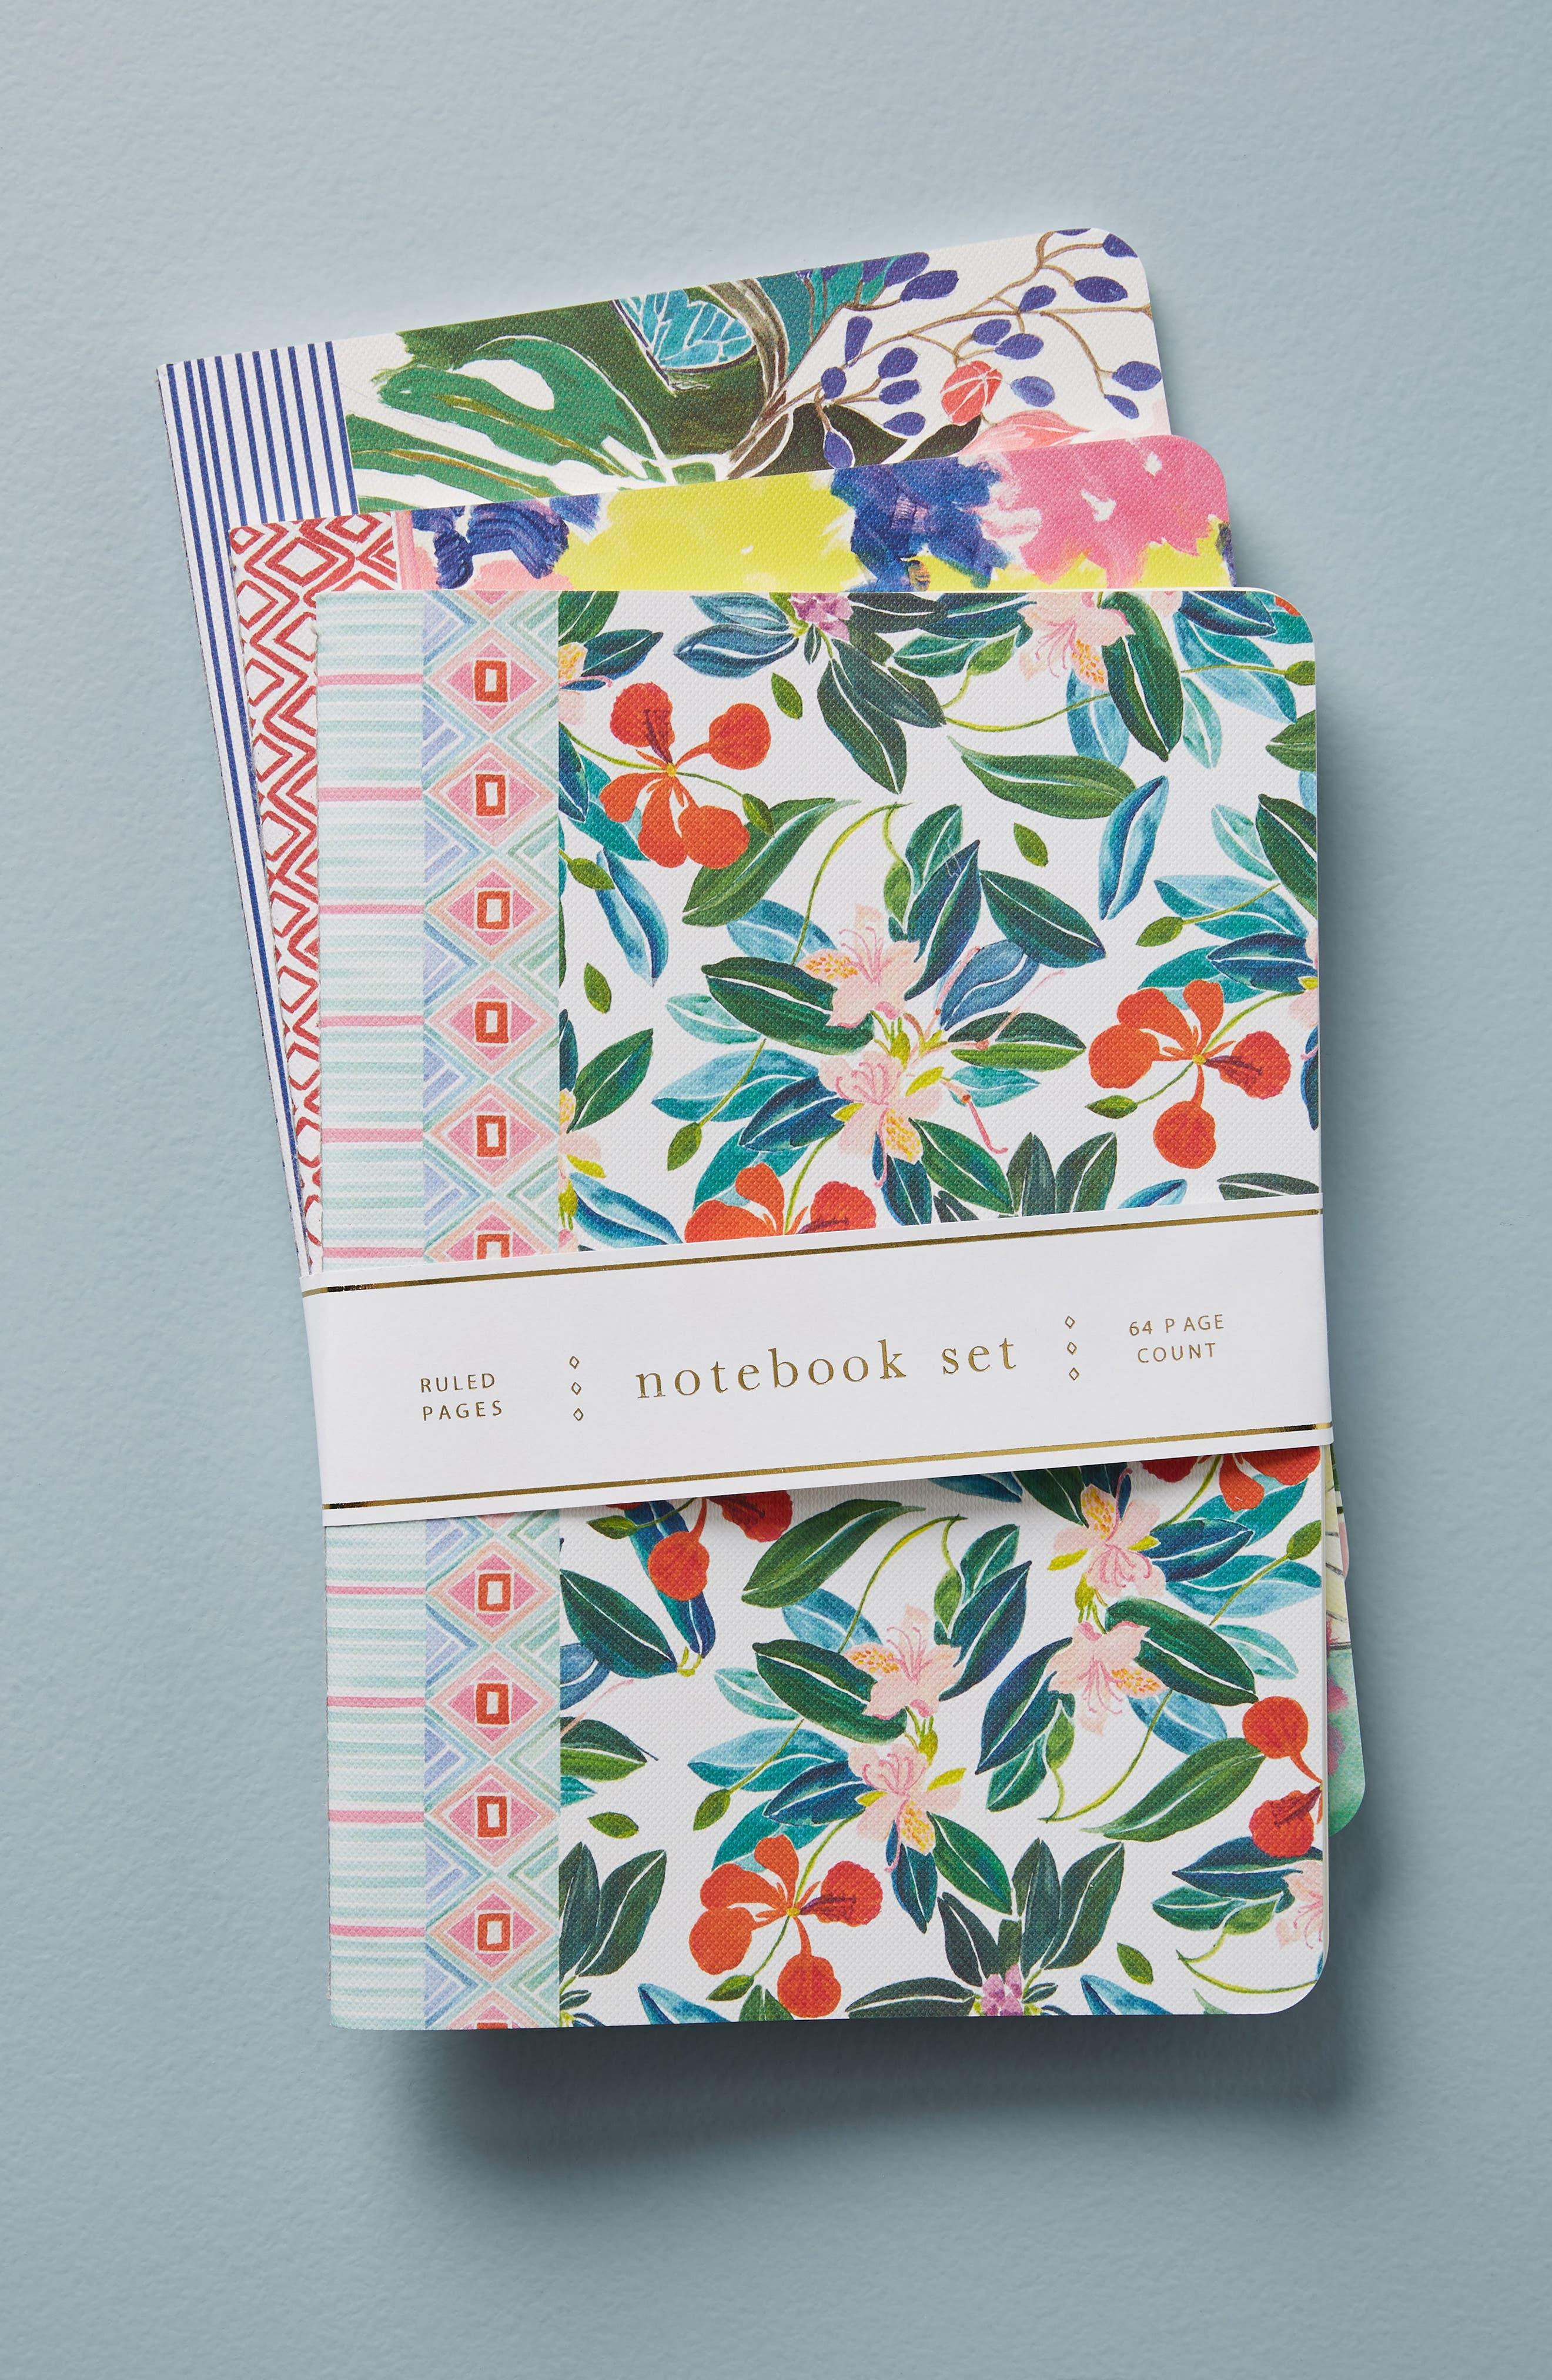 Sisters Gulassa Set of 3 Notebooks,                             Main thumbnail 1, color,                             Green